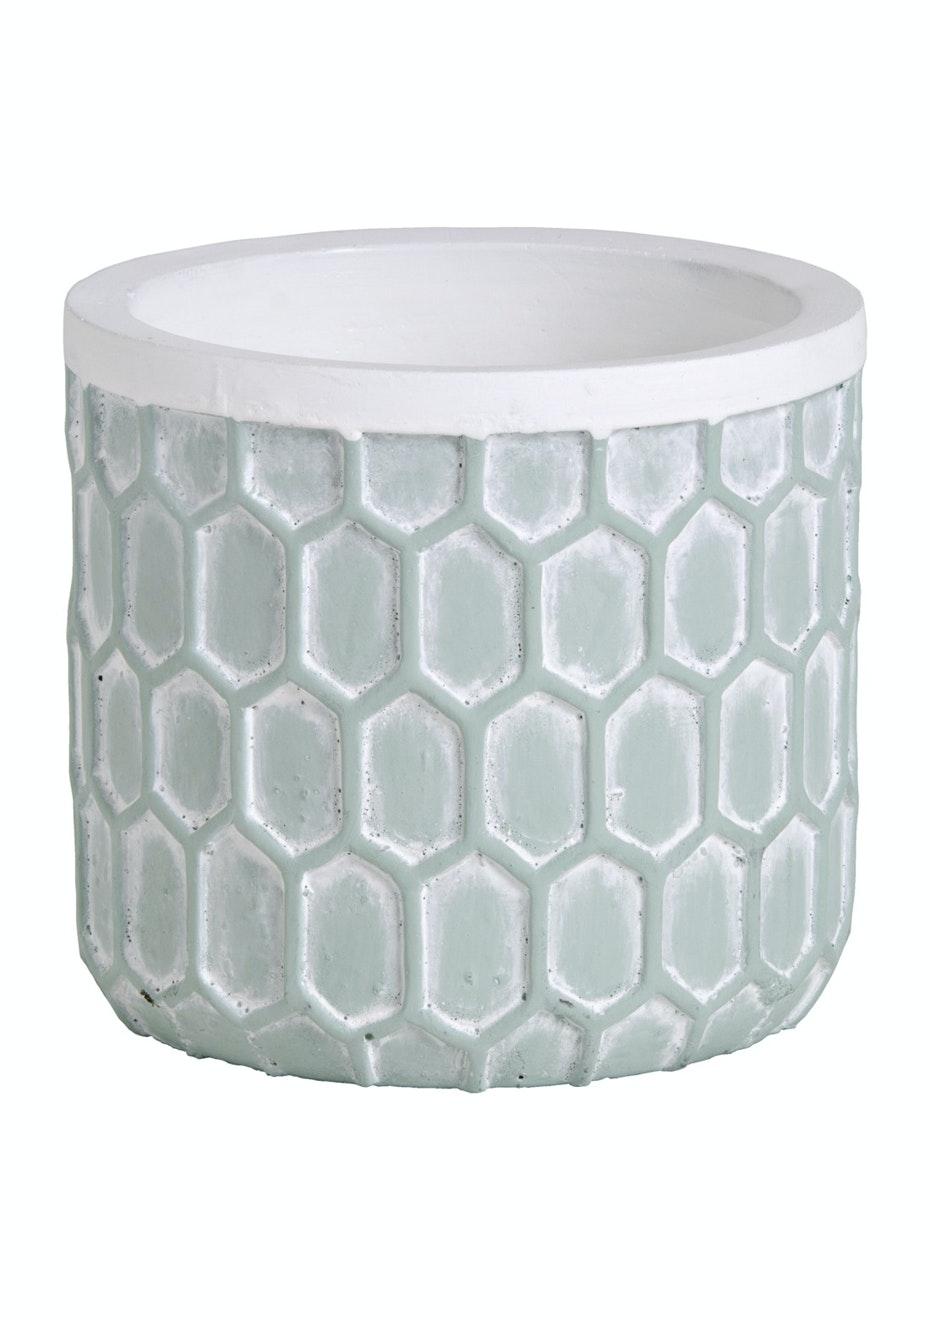 Jason - Concrete Hexagonal Planter - Mint